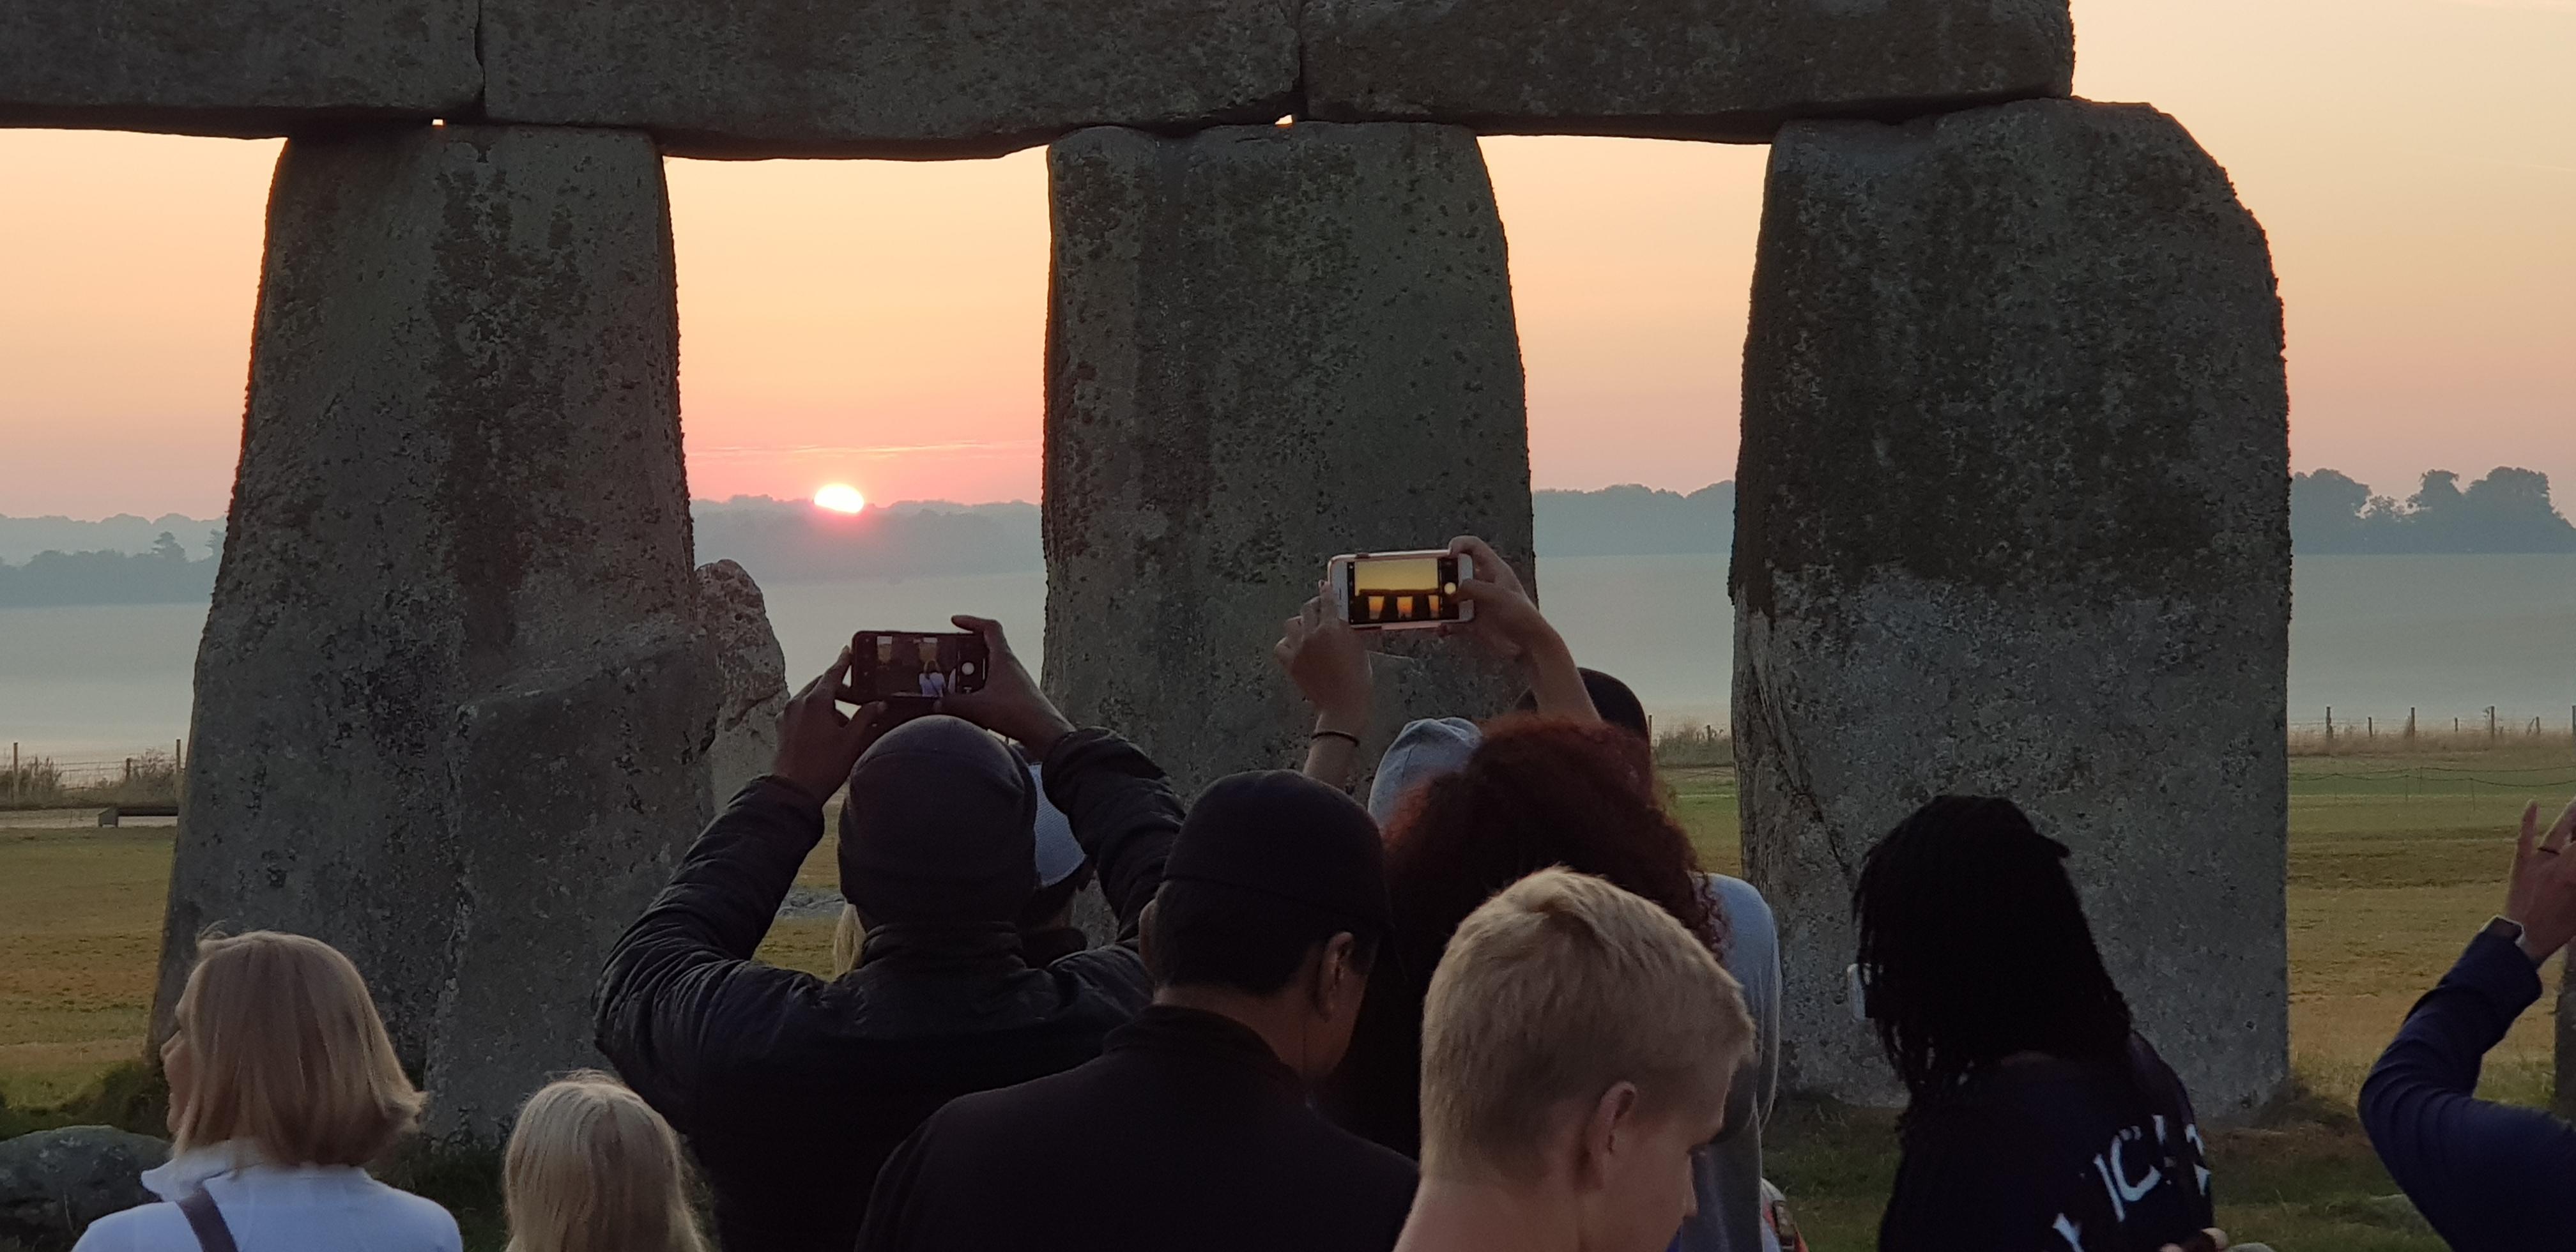 Stonehenge Private Access Sunset Tour.  A unique photo opprtunity